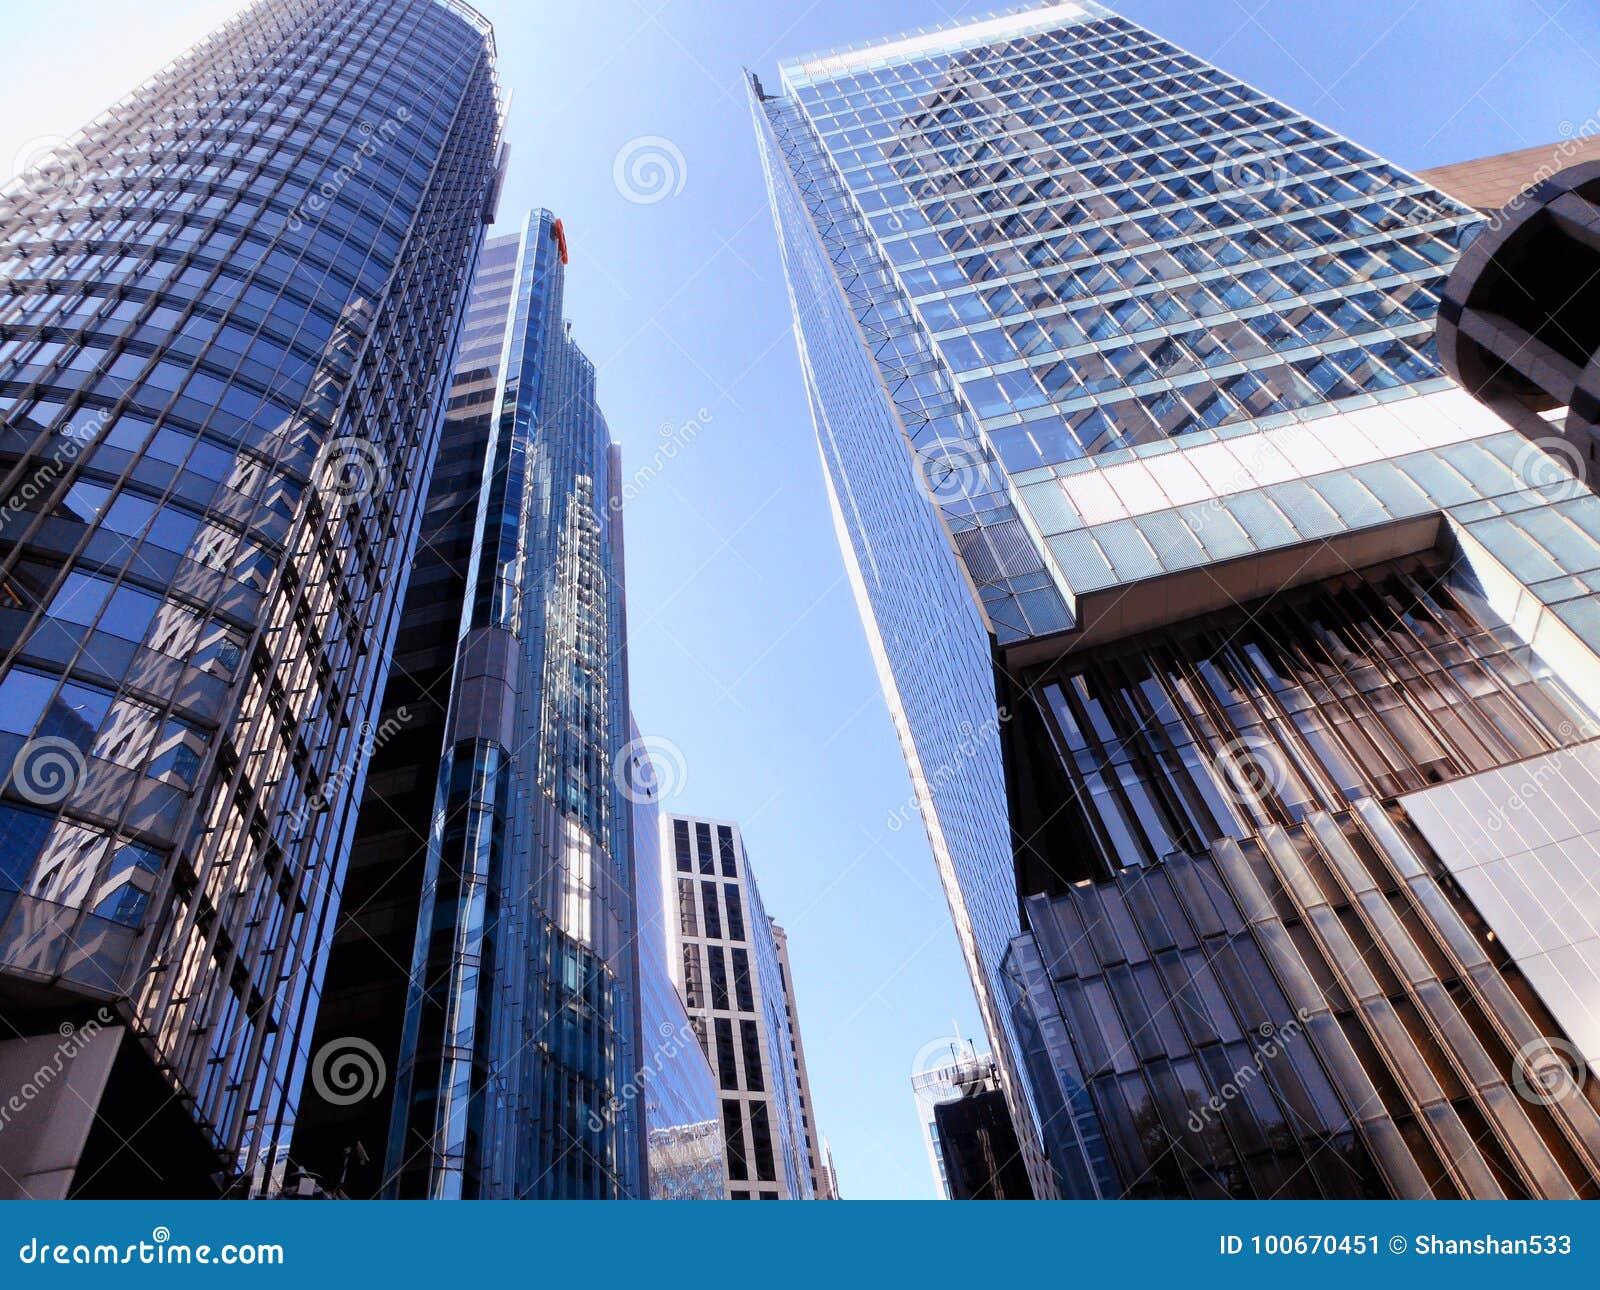 glass exterior modern office. Download Comp Glass Exterior Modern Office